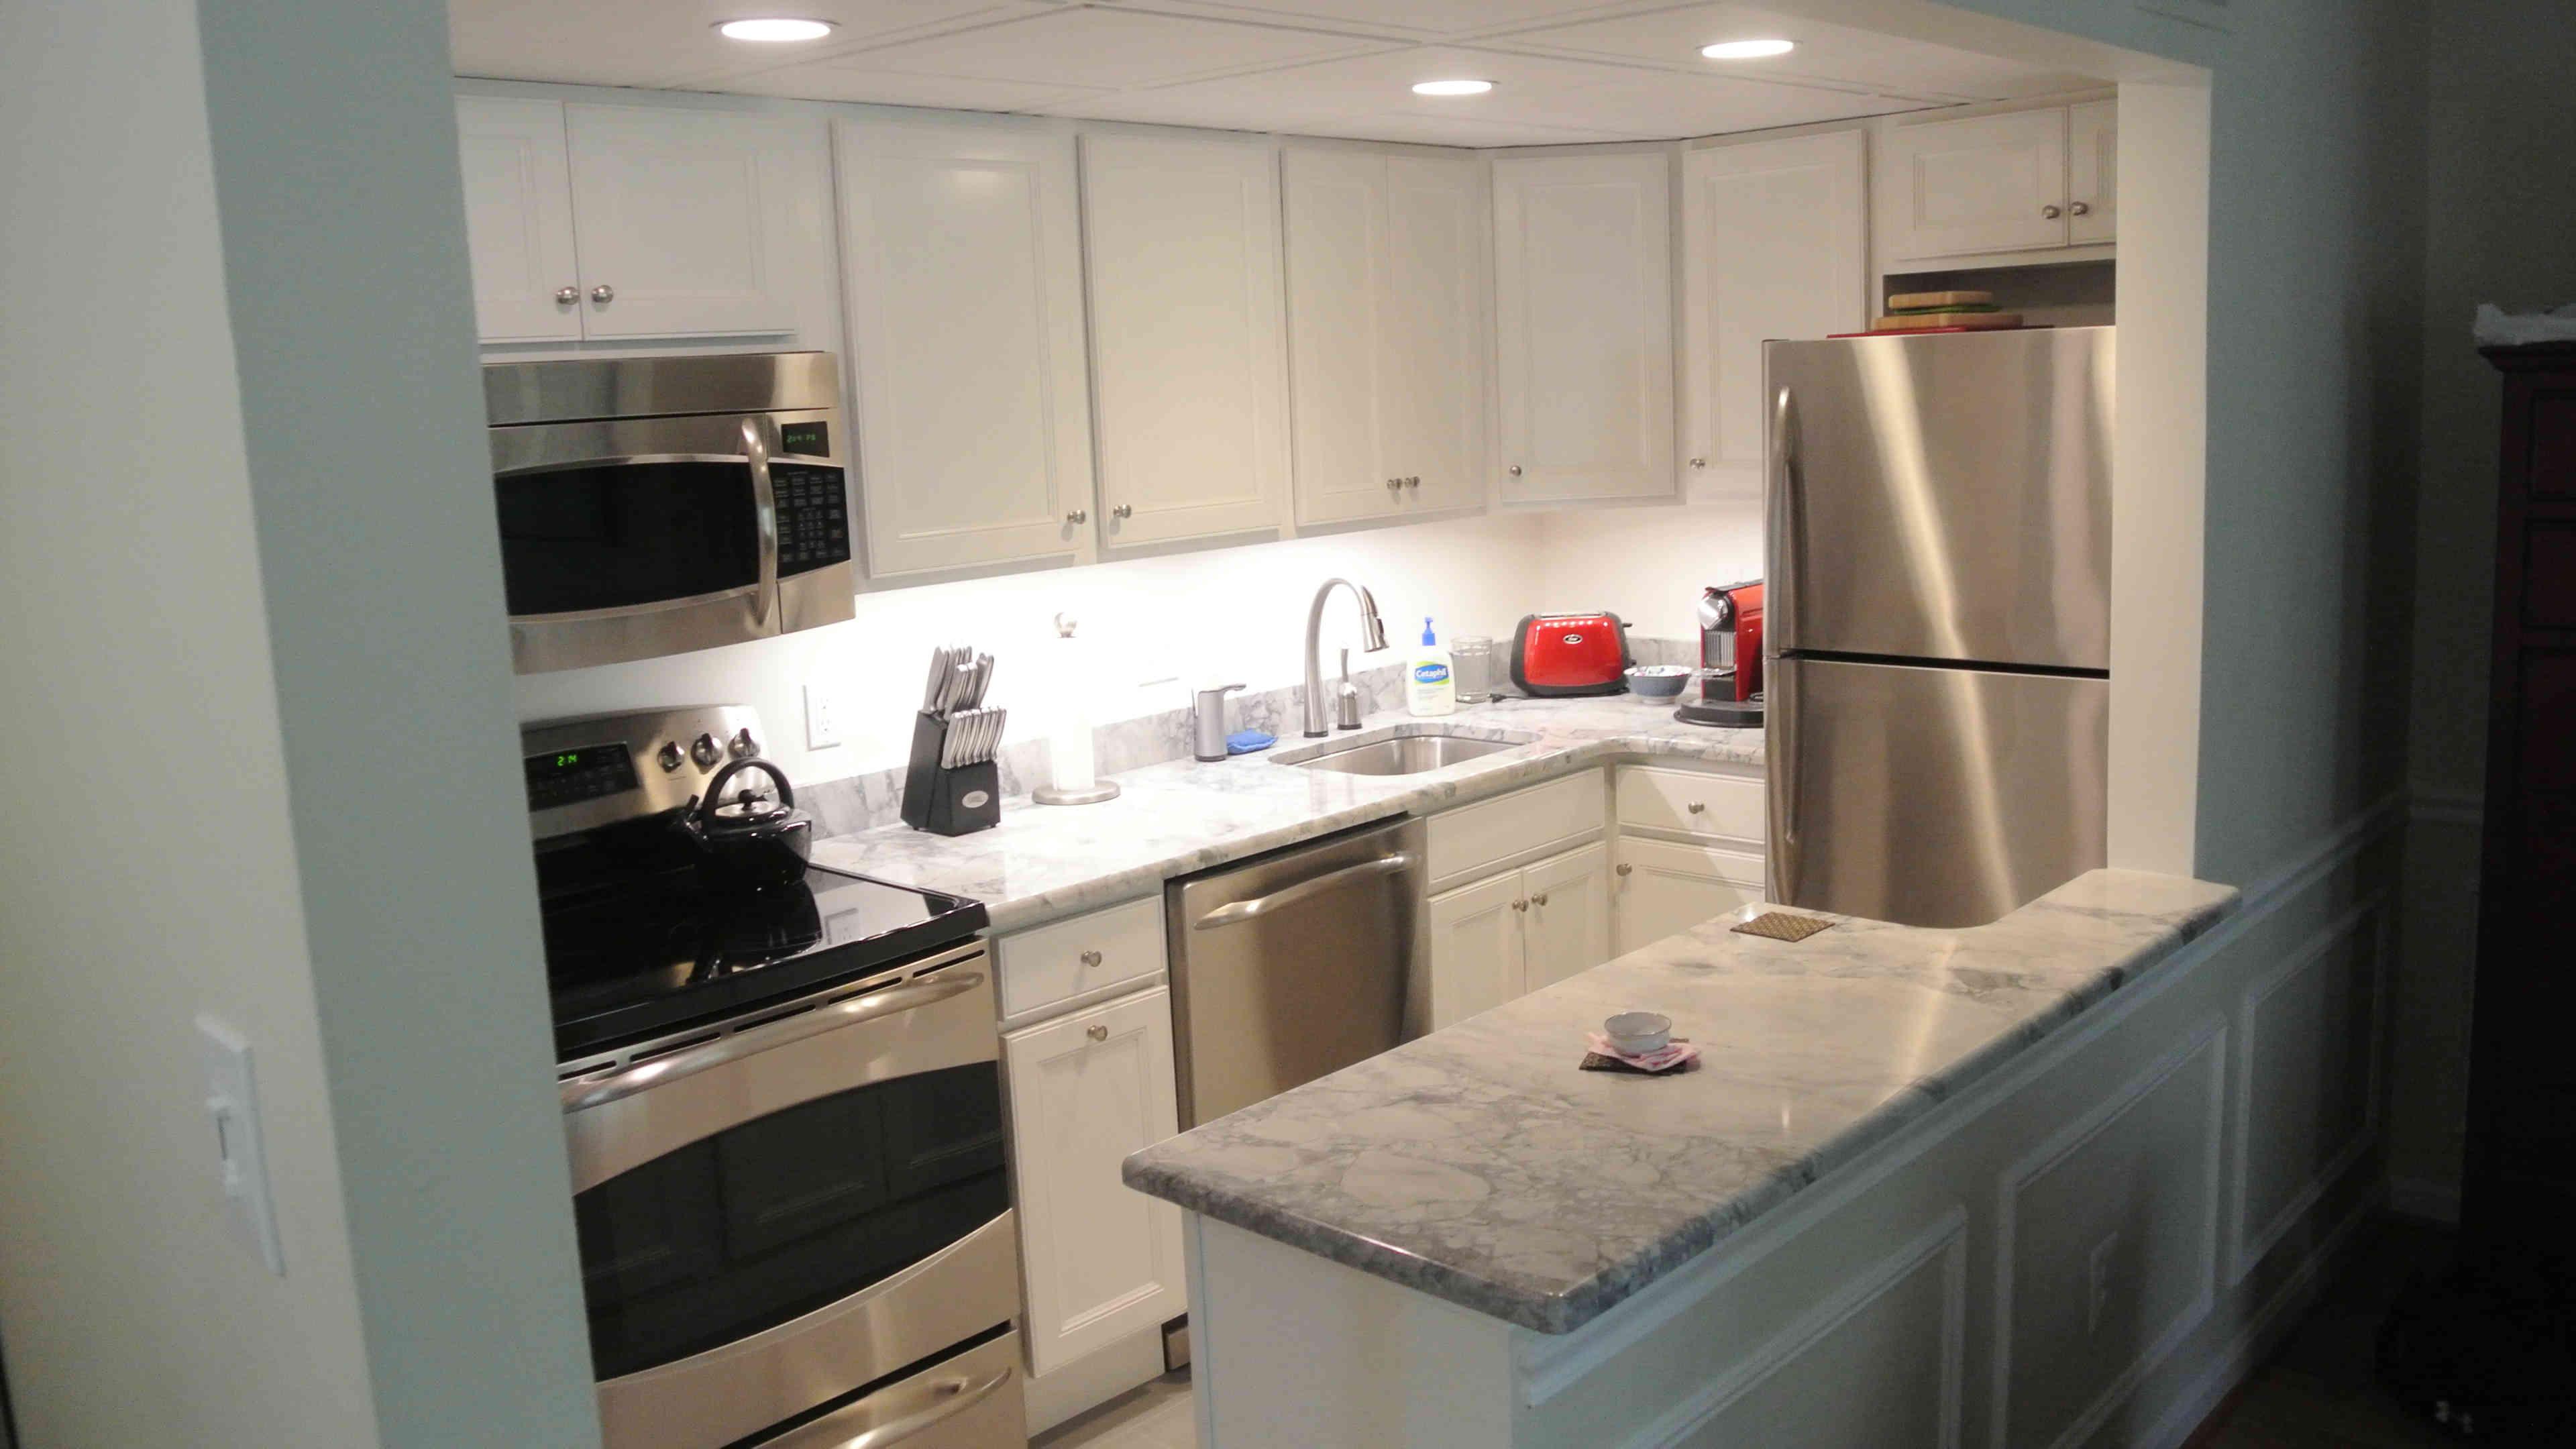 kitchen remodeling in washington dc & bethesda md - melness contractors